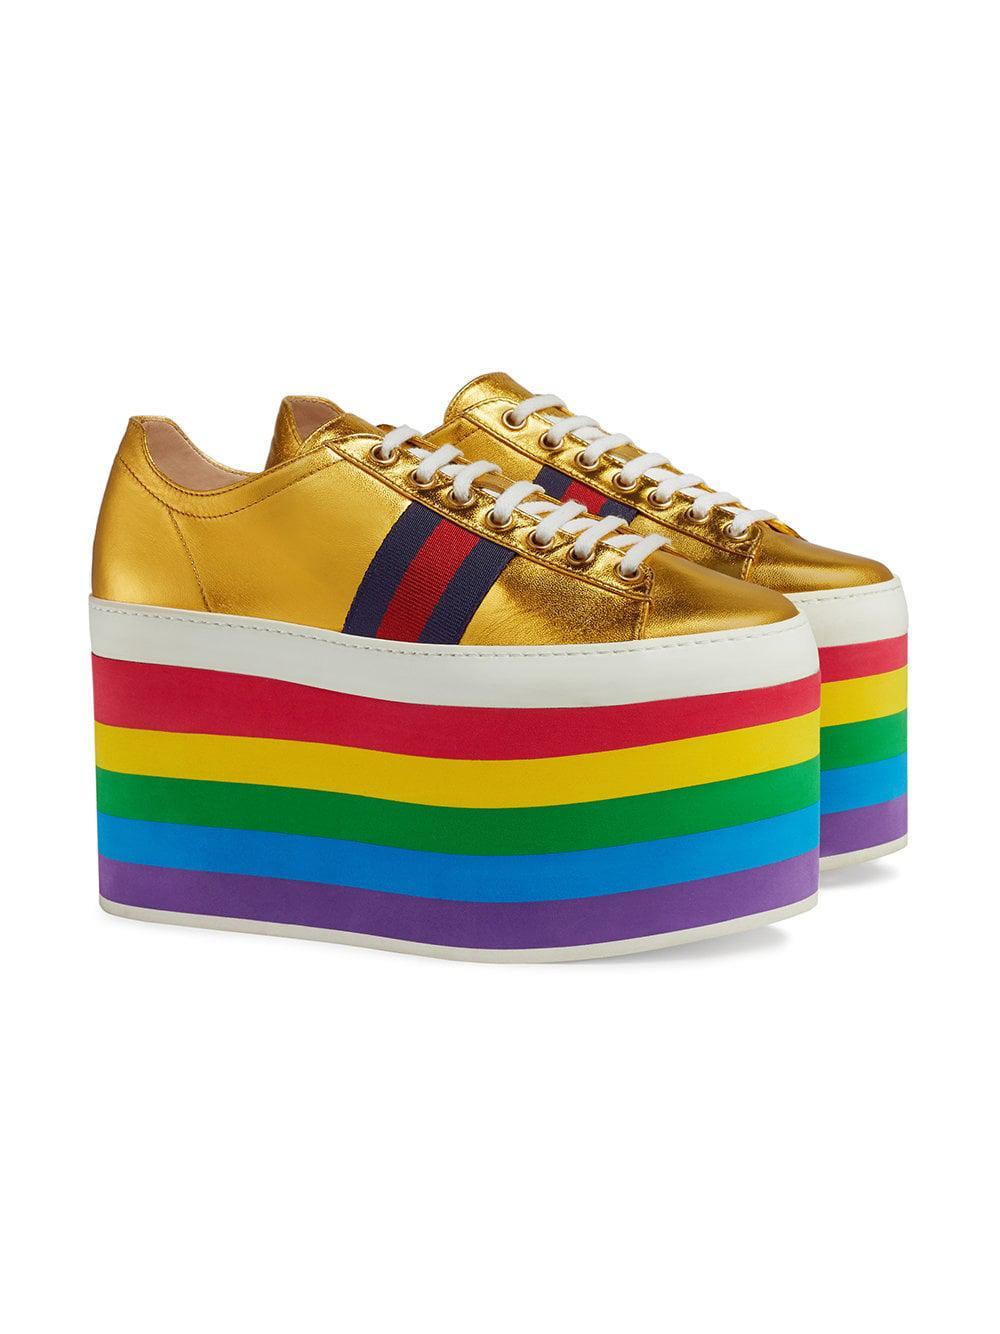 def476b9e Gucci - Yellow Metallic Platform Sneaker - Lyst. View fullscreen